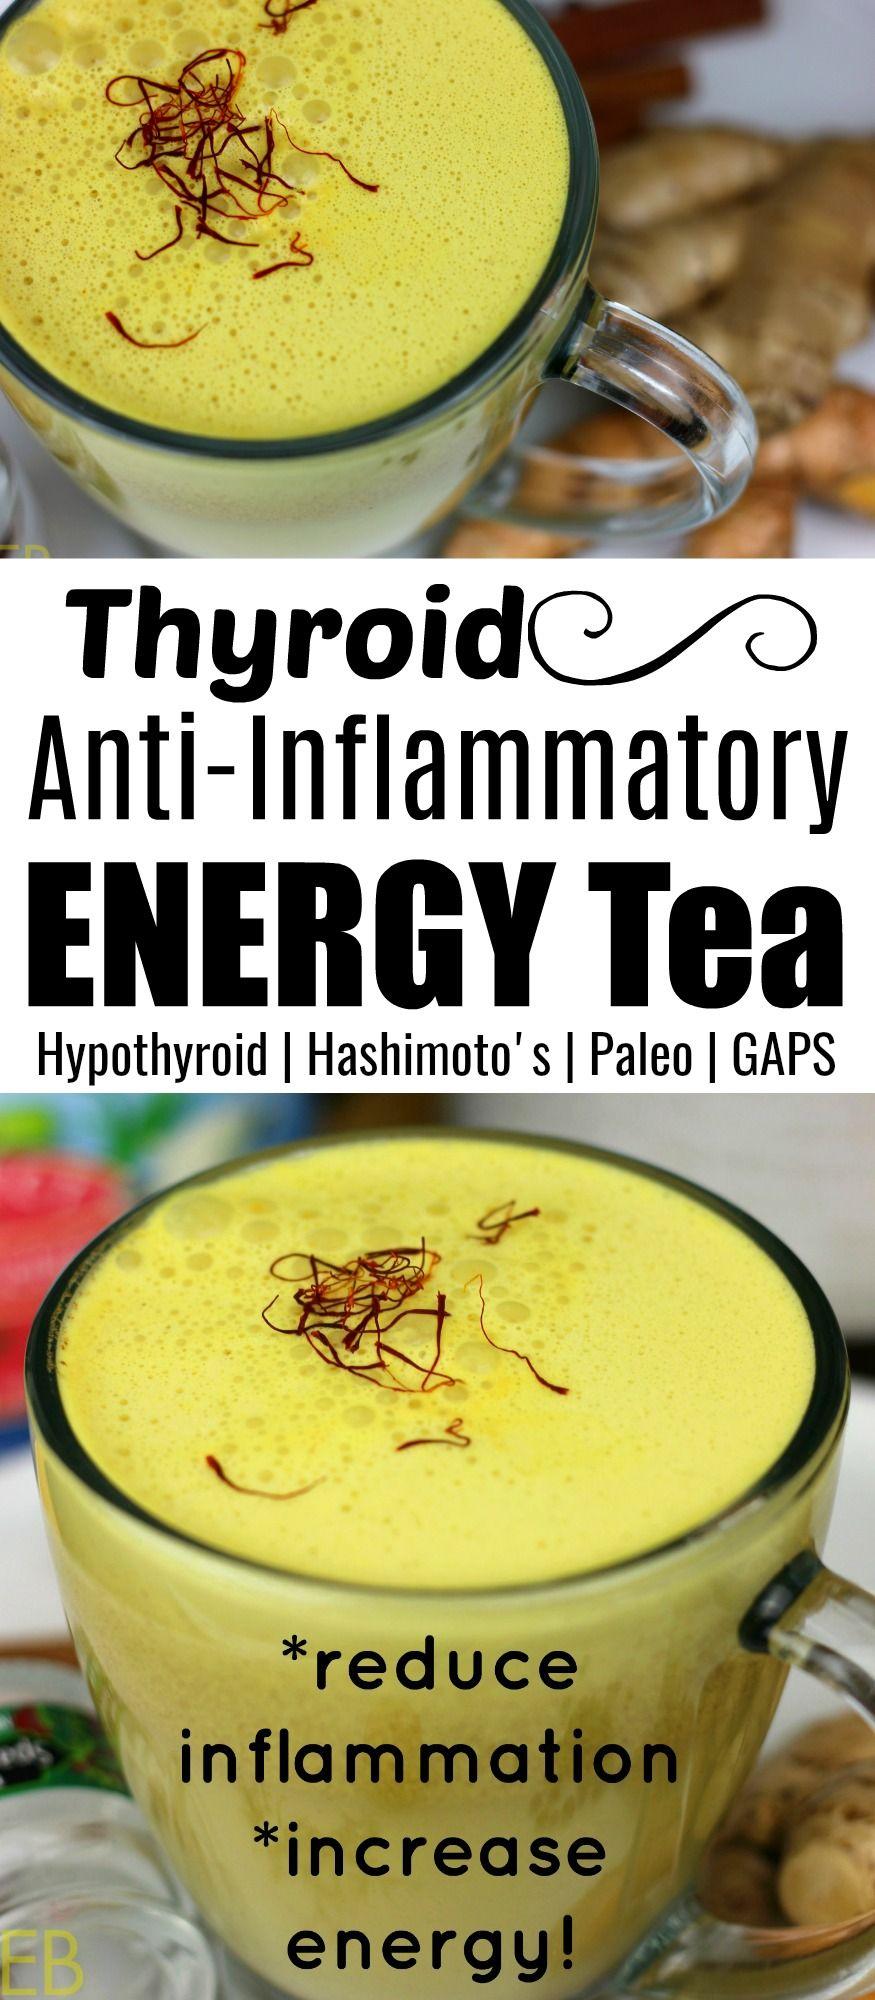 Thyroid Anti-inflammatory Energy Tea Recipe in 2020 Energy tea Anti inflammatory recipes